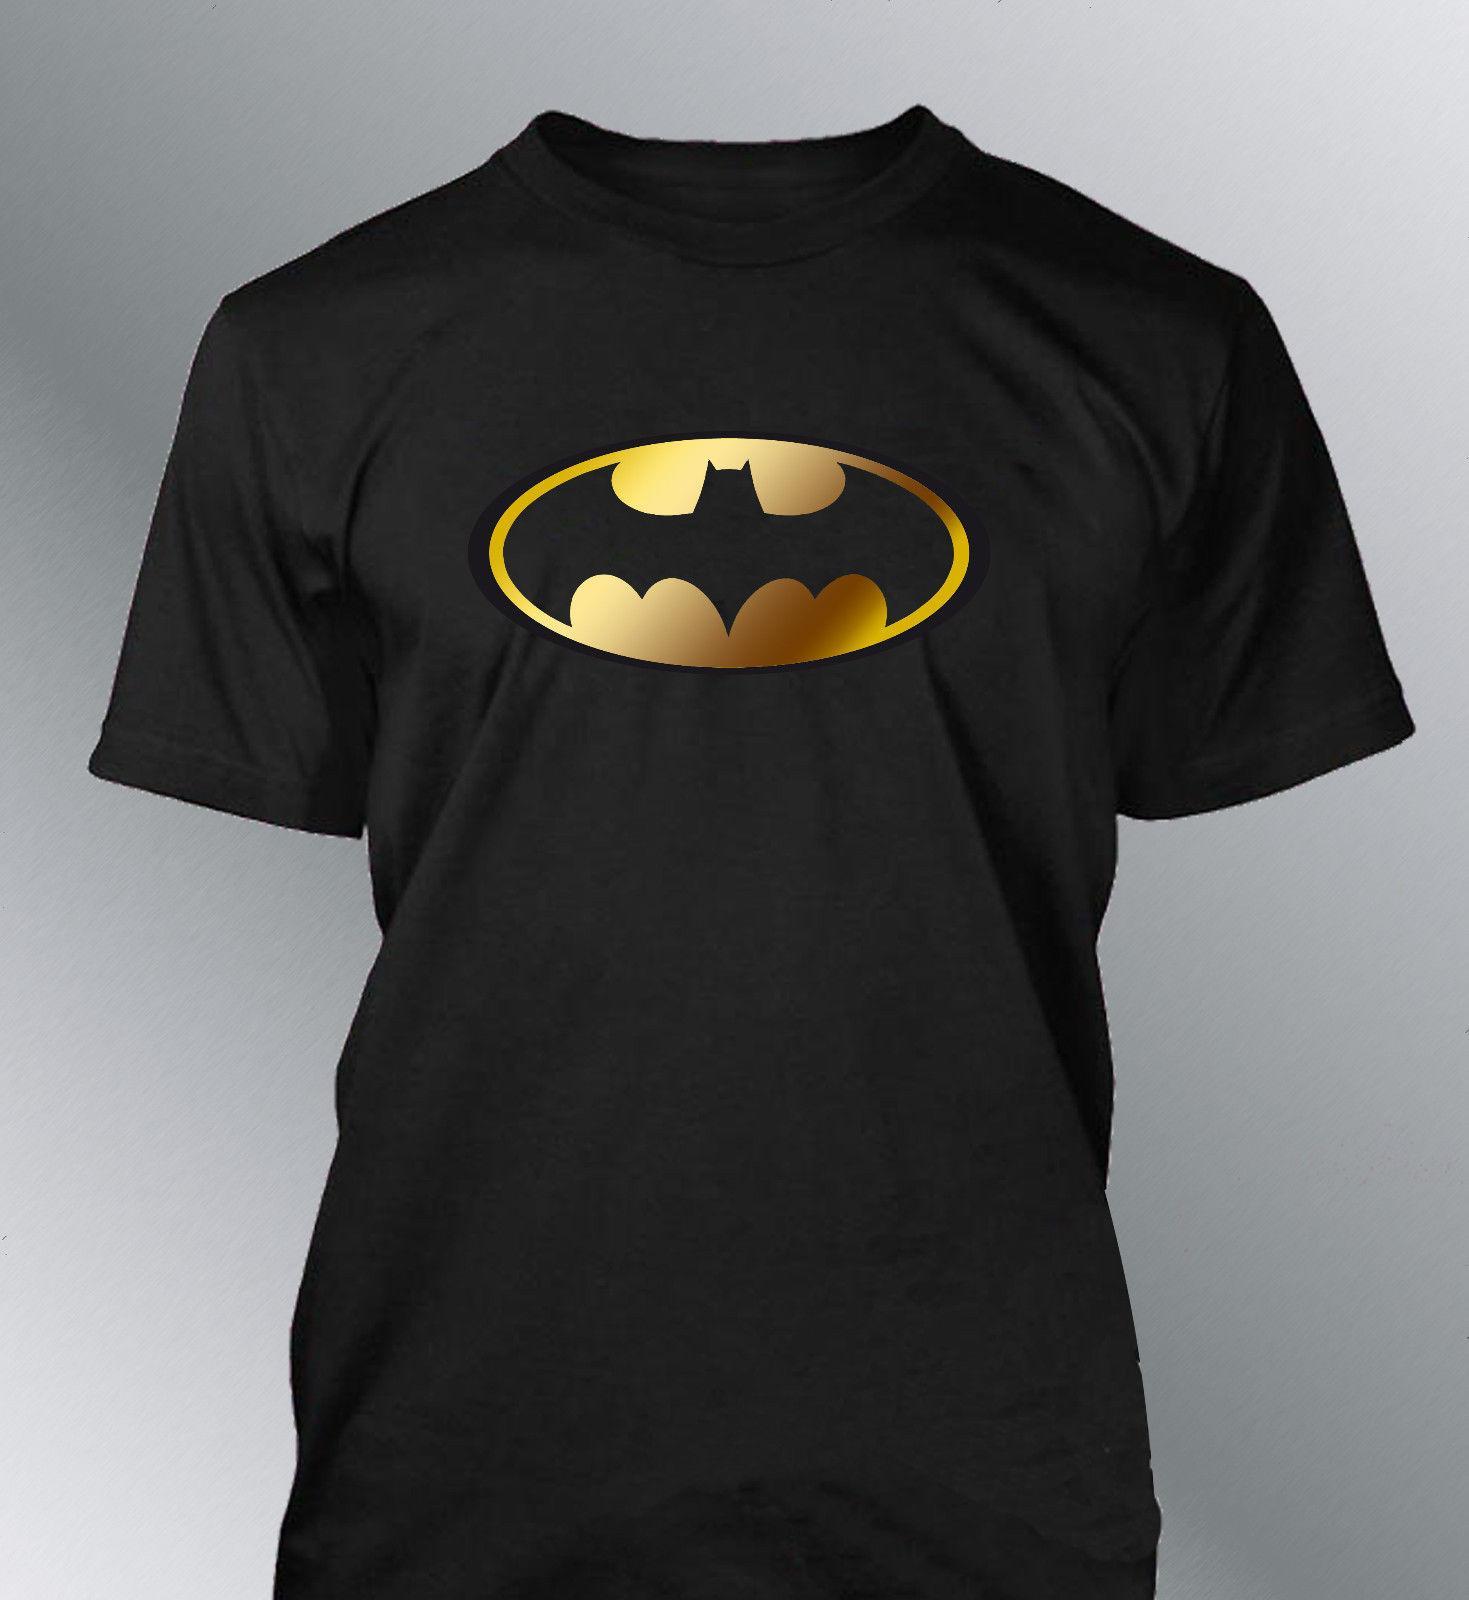 Xxl Oro Amarillo Compre L Camiseta Batman M Hombre Superhéroes Xl S rqY4zvqd